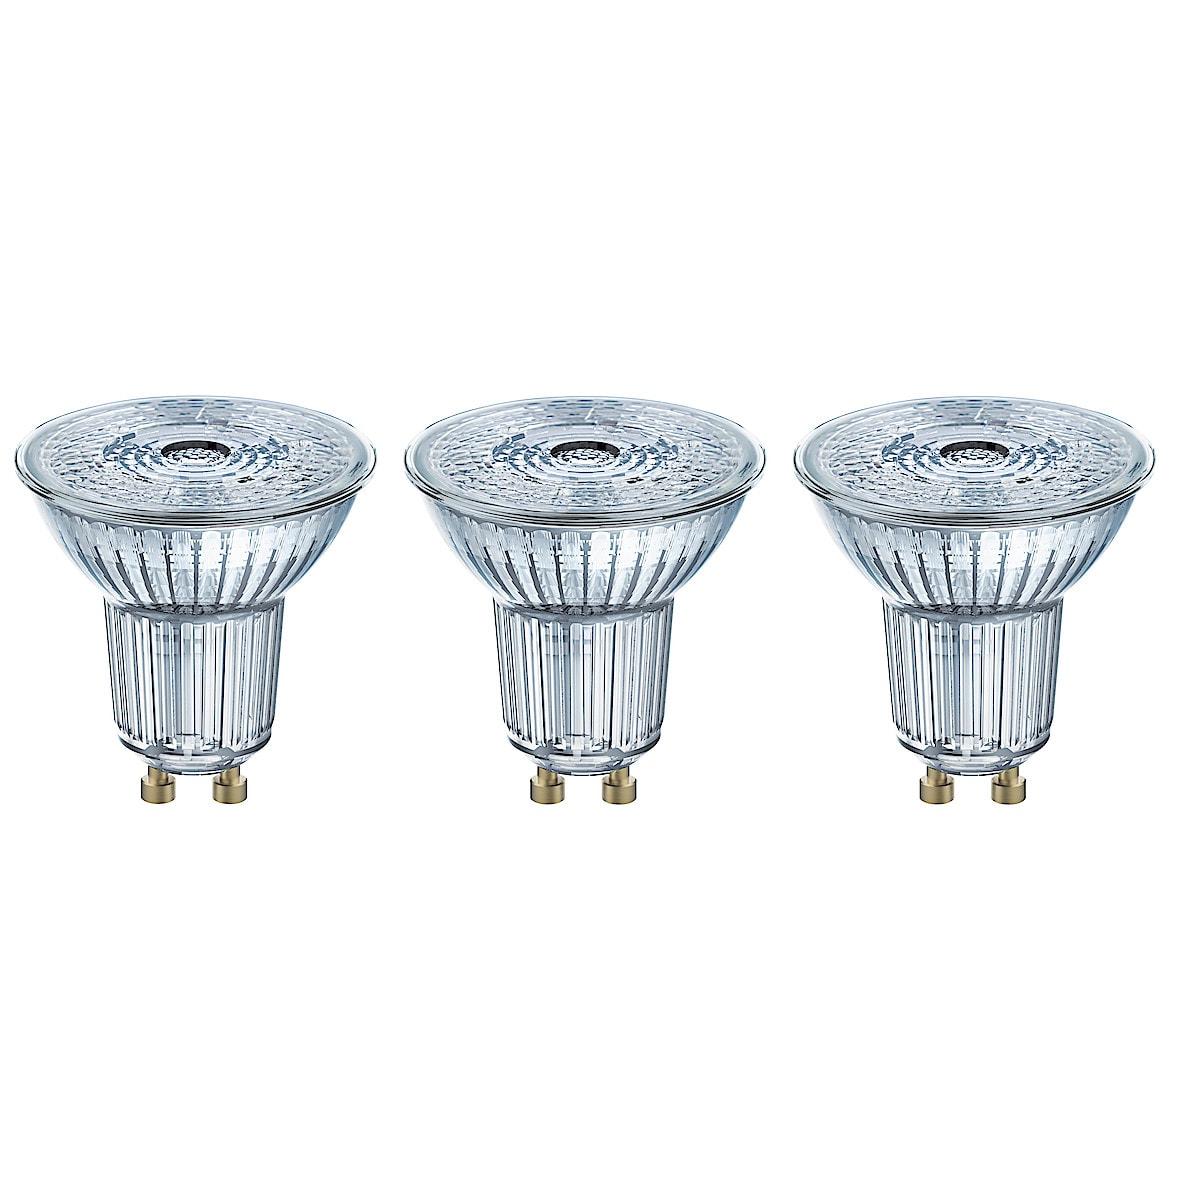 Osram LED-pære GU10, 3-pack